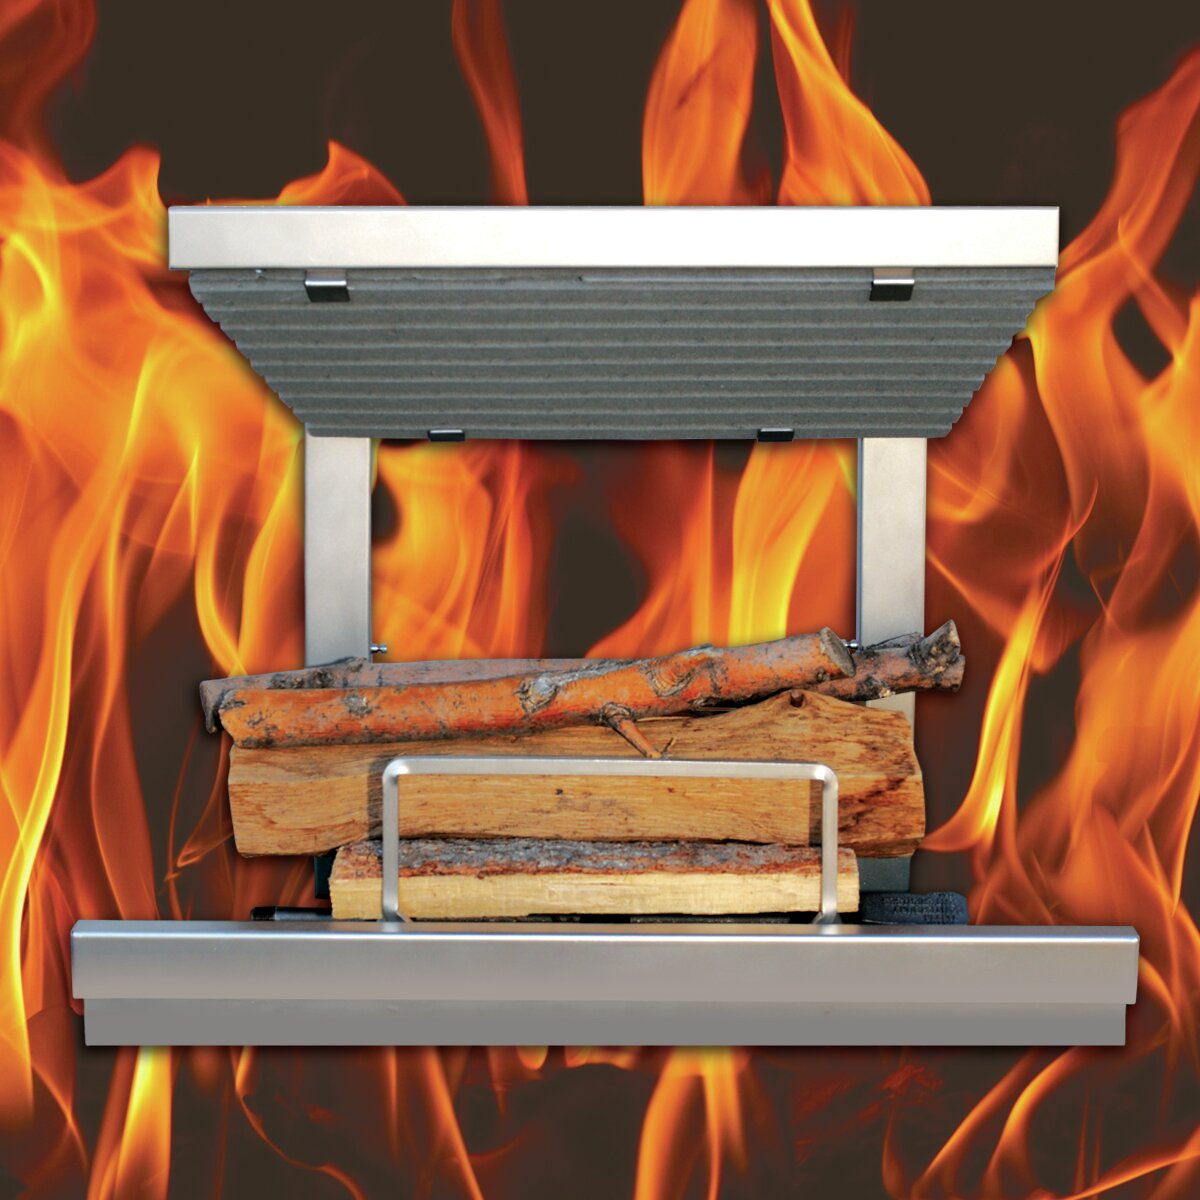 Earth S Flame Hybrid Clean Burn Wood Burning Fireplace Insert